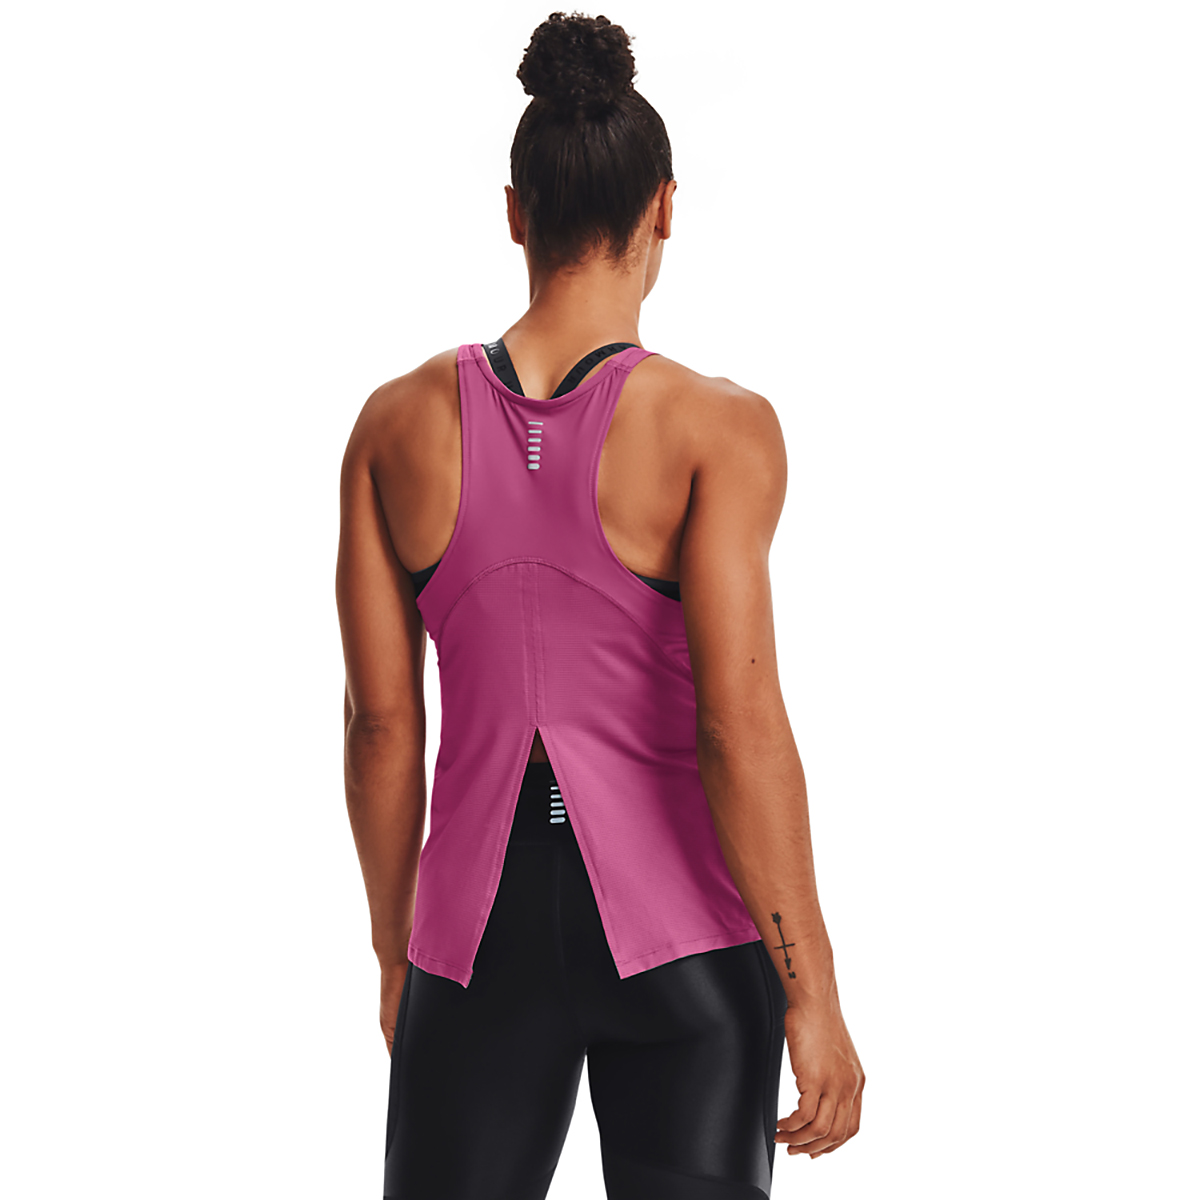 Women's Under Armour Iso-Chill Run 200 Tank - Color: Pink Quartz - Size: XS, Pink Quartz, large, image 2